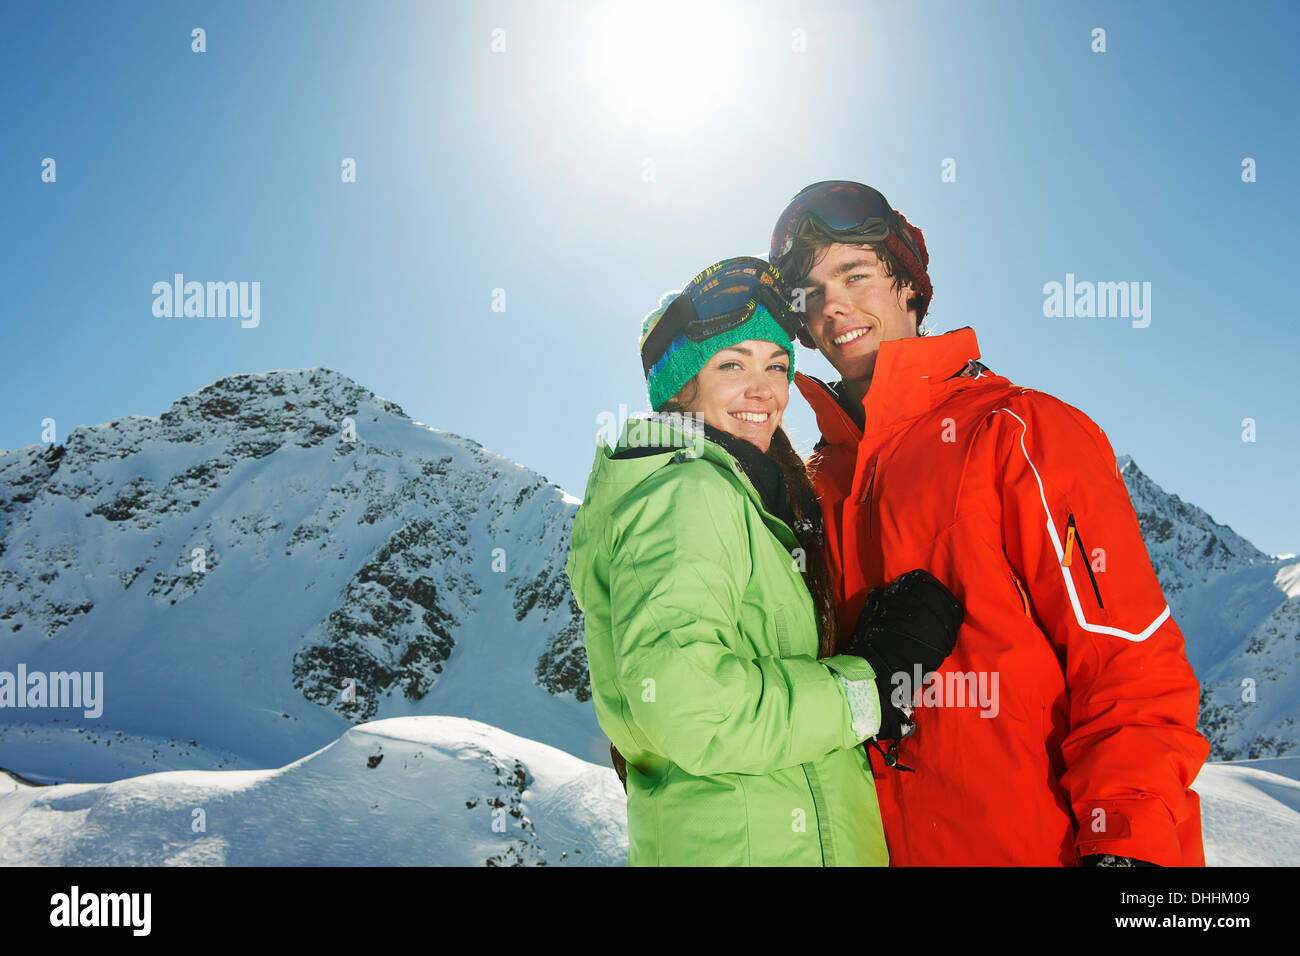 Couple wearing skiwear, Kuhtai, Austria - Stock Image